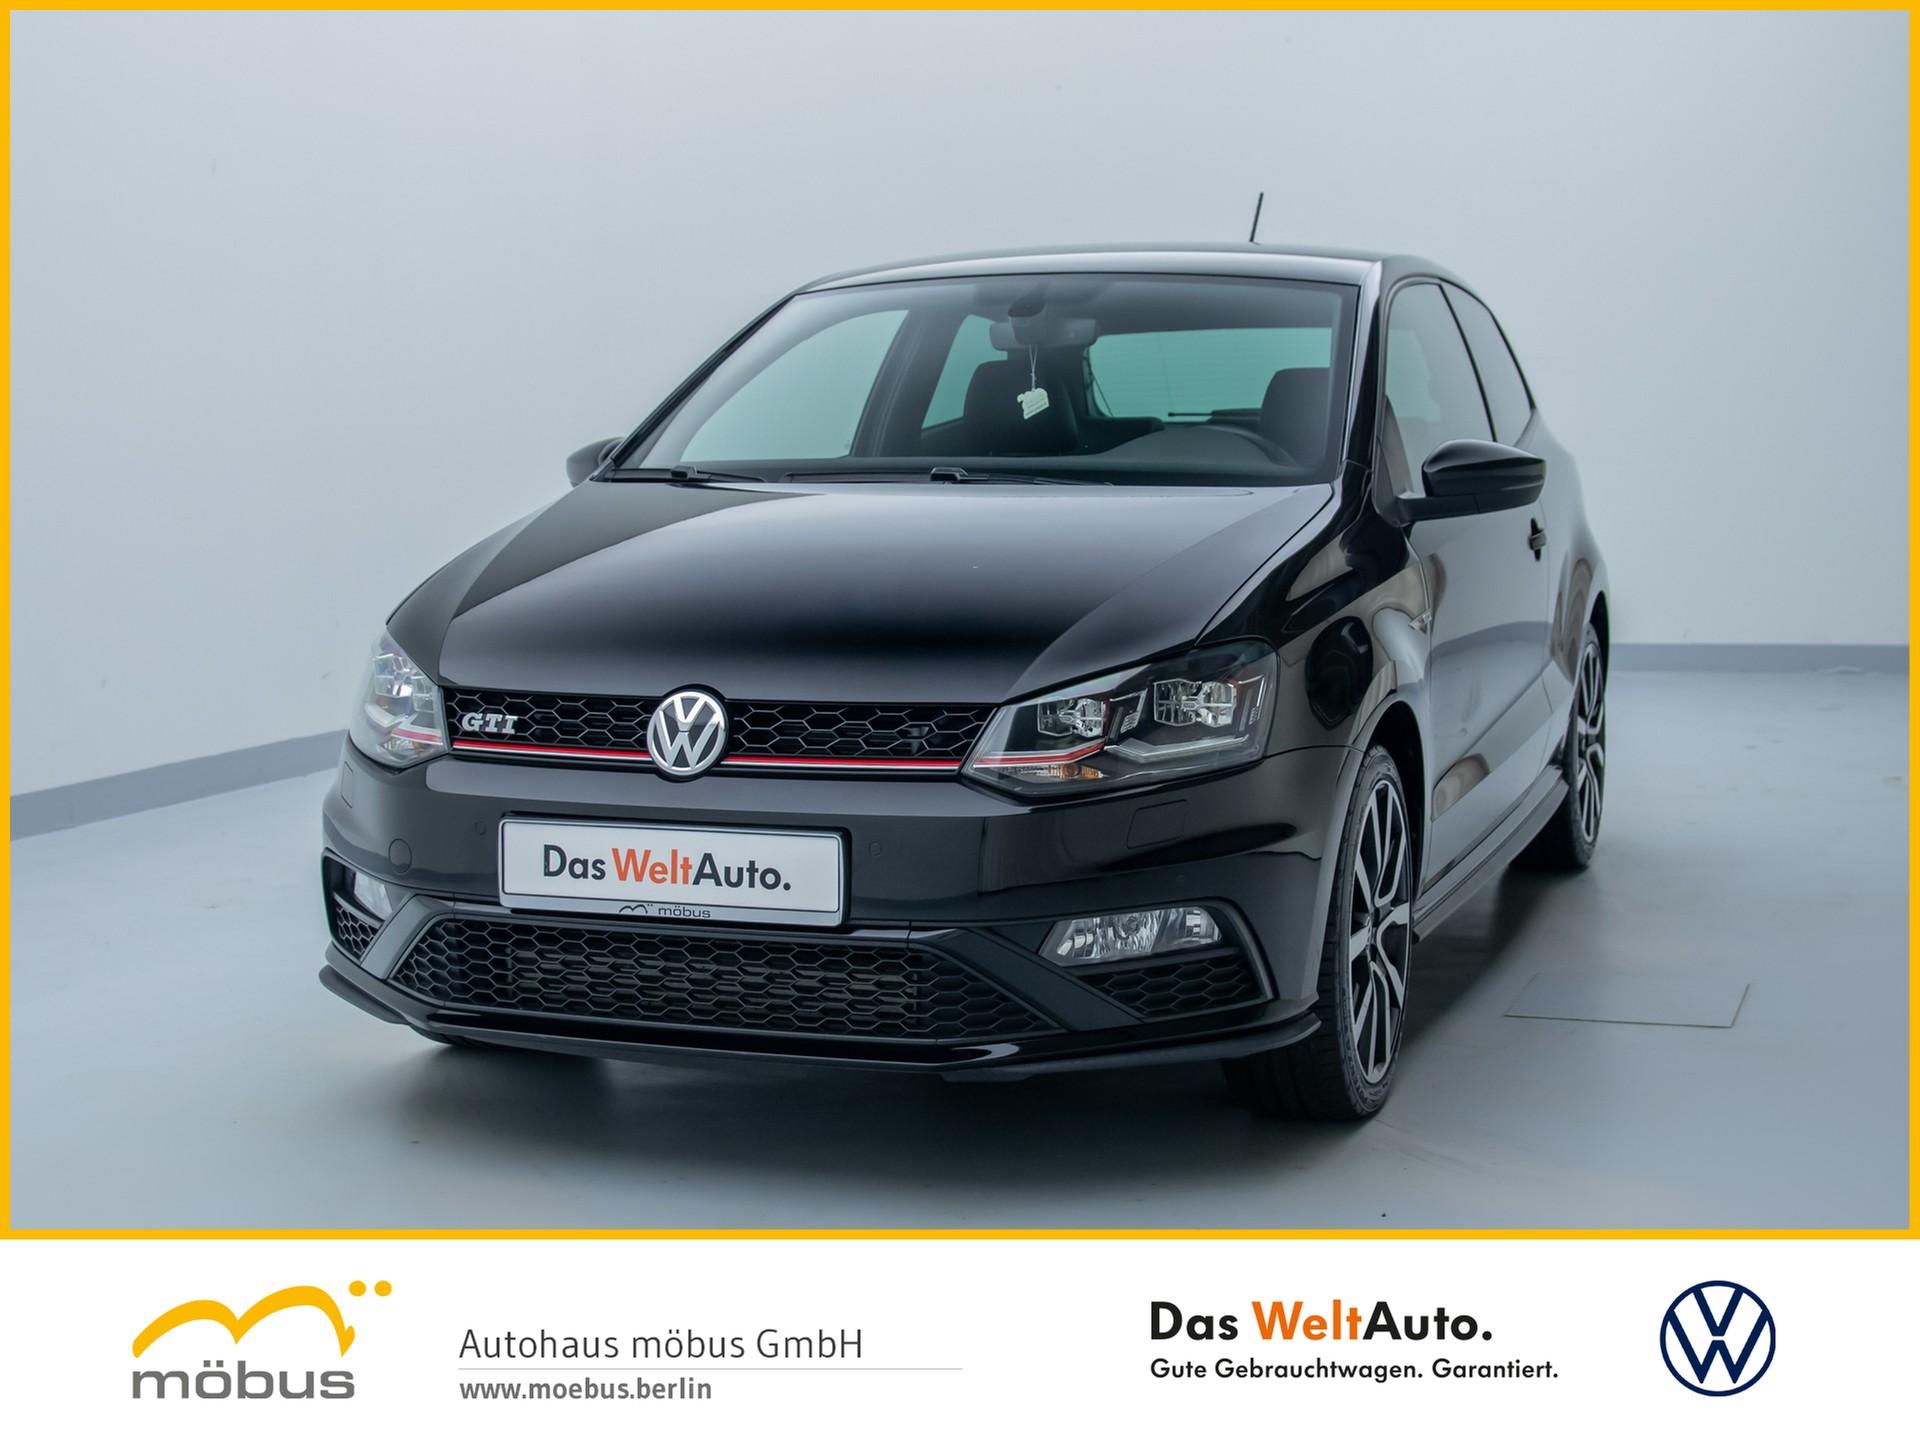 Volkswagen Polo 1.8 TSI GTI LED+NAVIGATION+PDC+KLIMA+GRA, Jahr 2016, Benzin